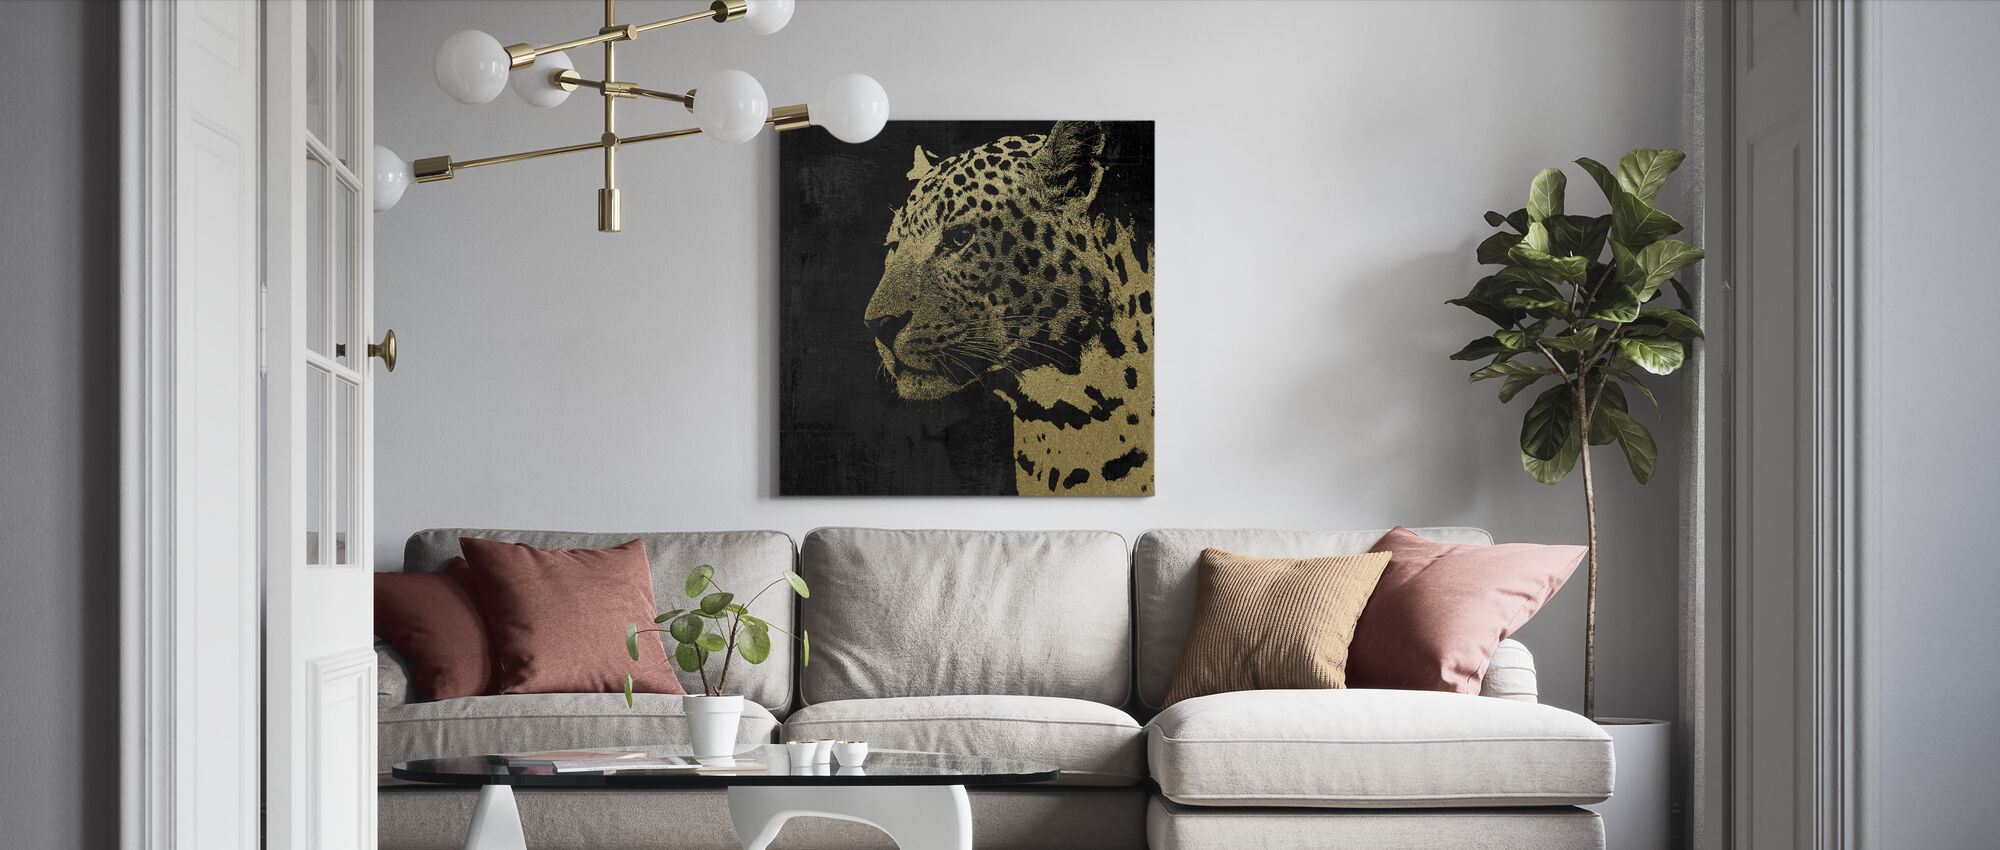 Gold Leopard - Canvas print - Living Room